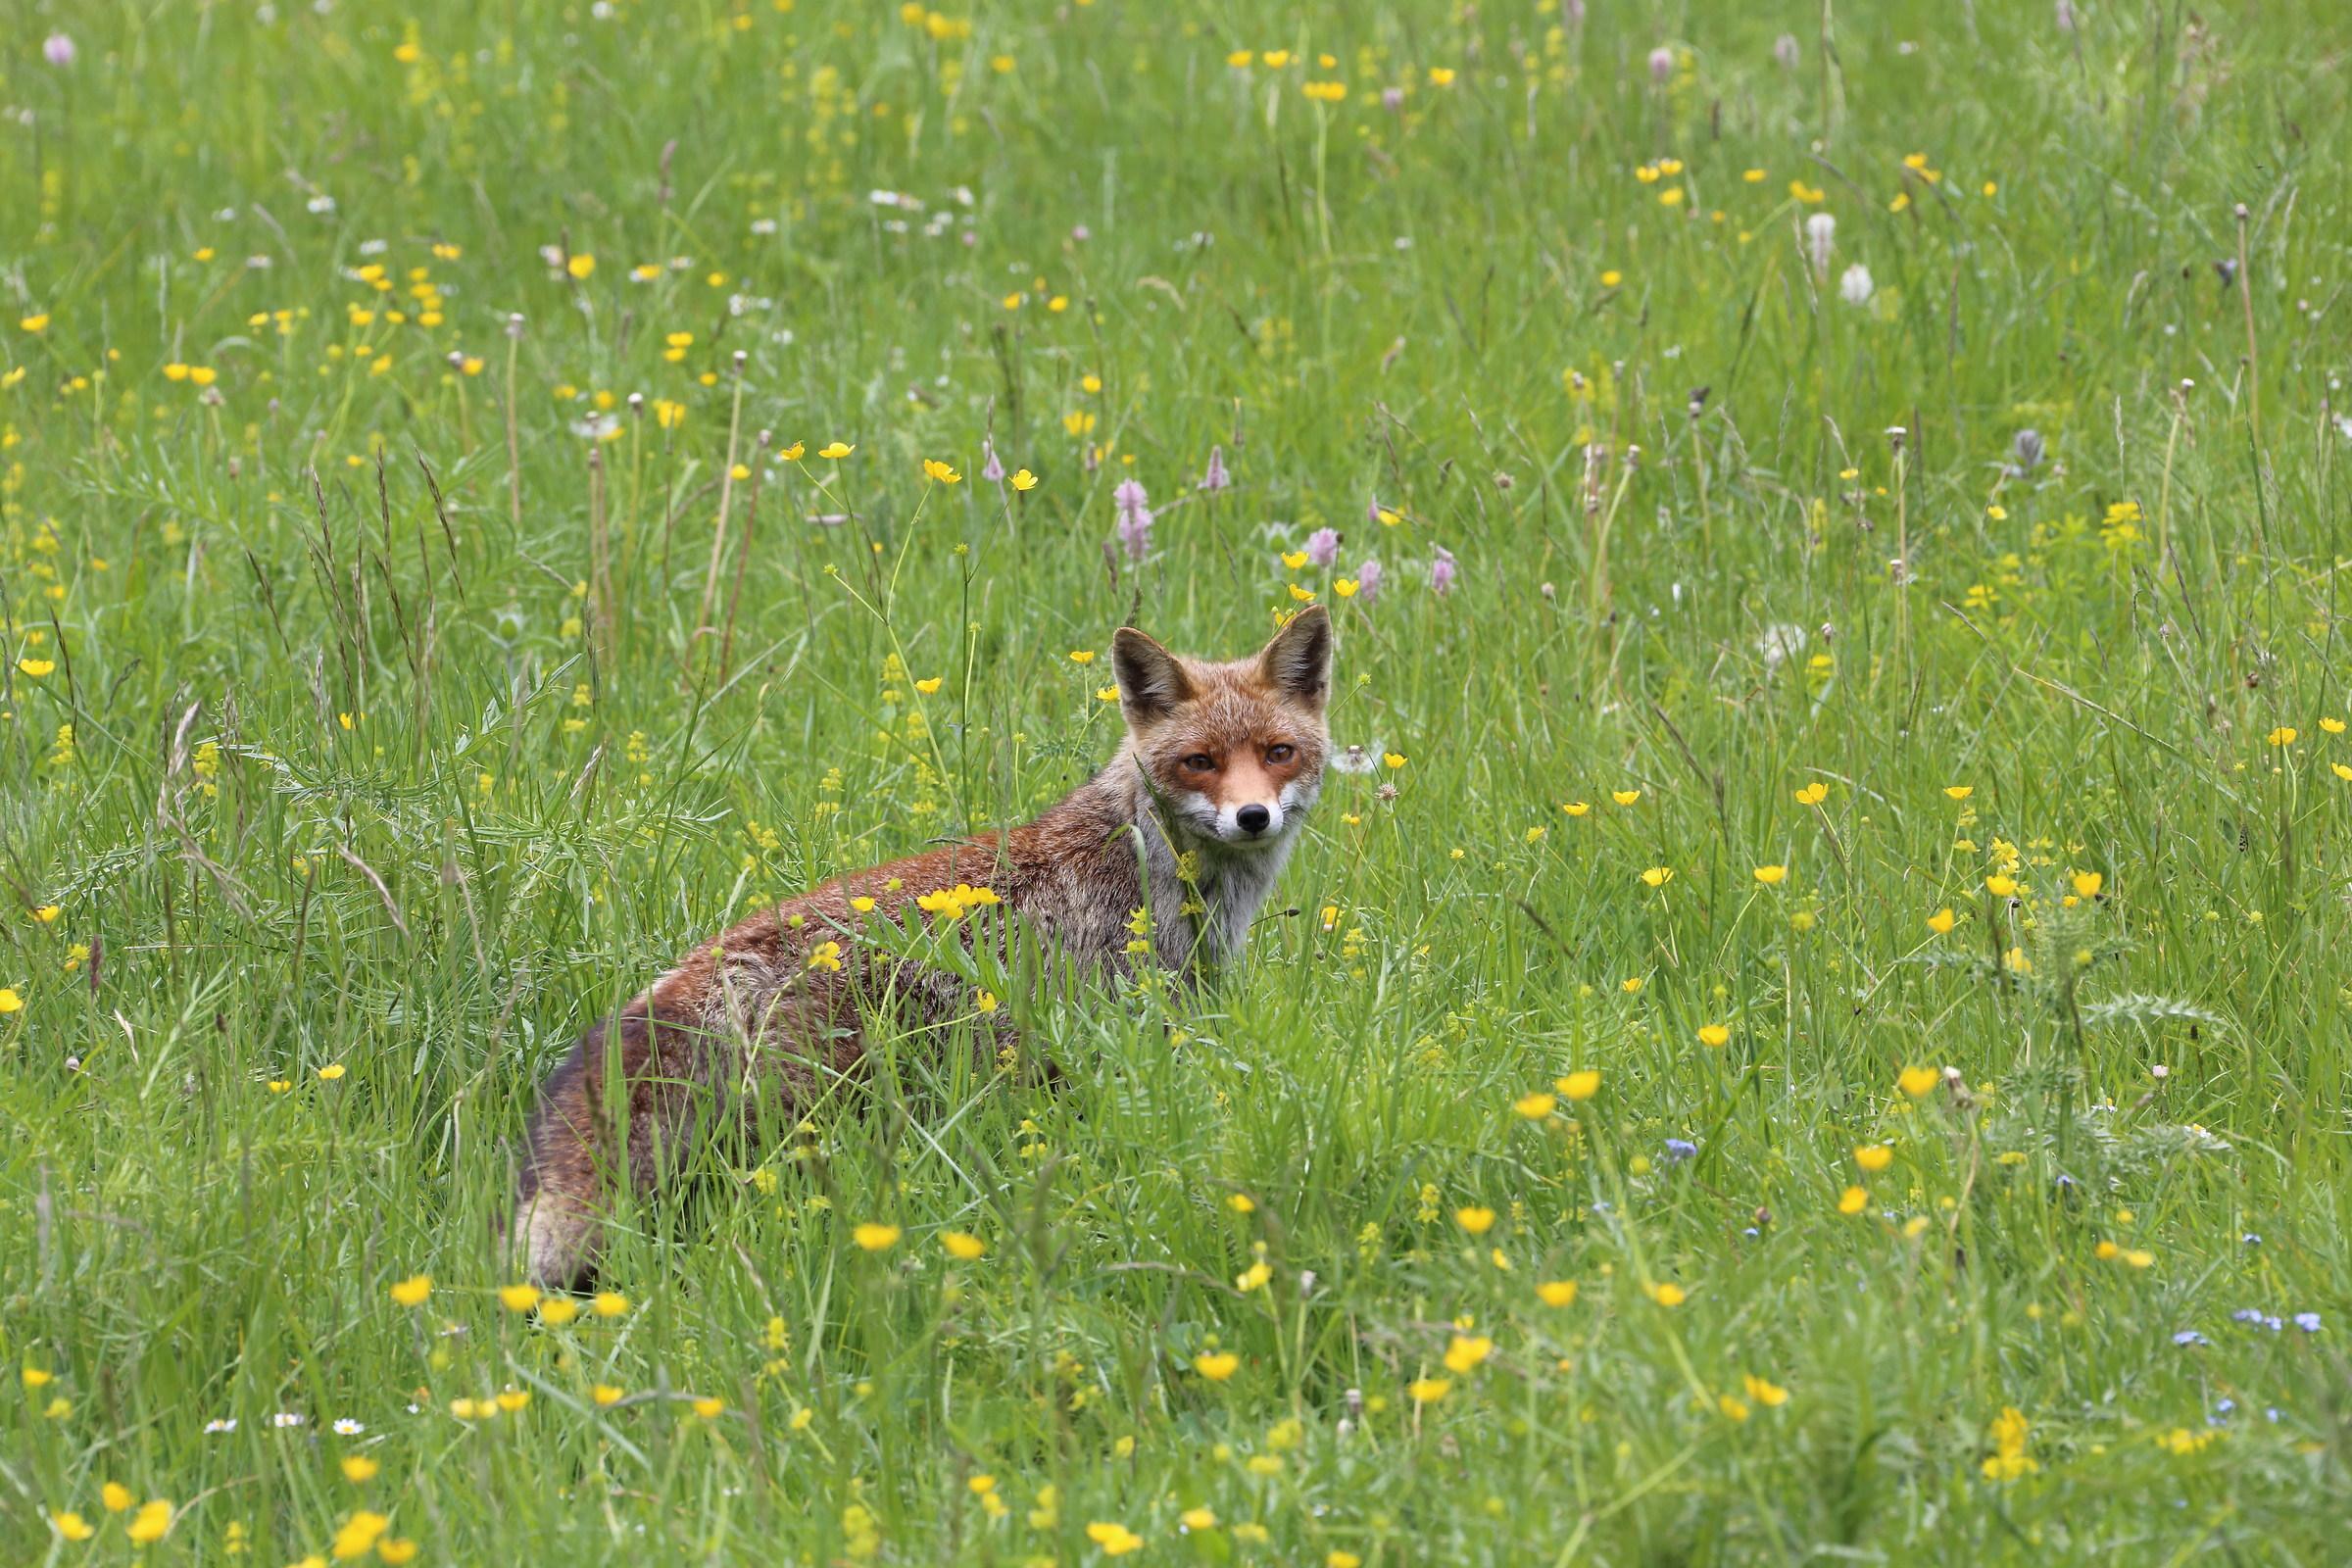 The fox spring!...